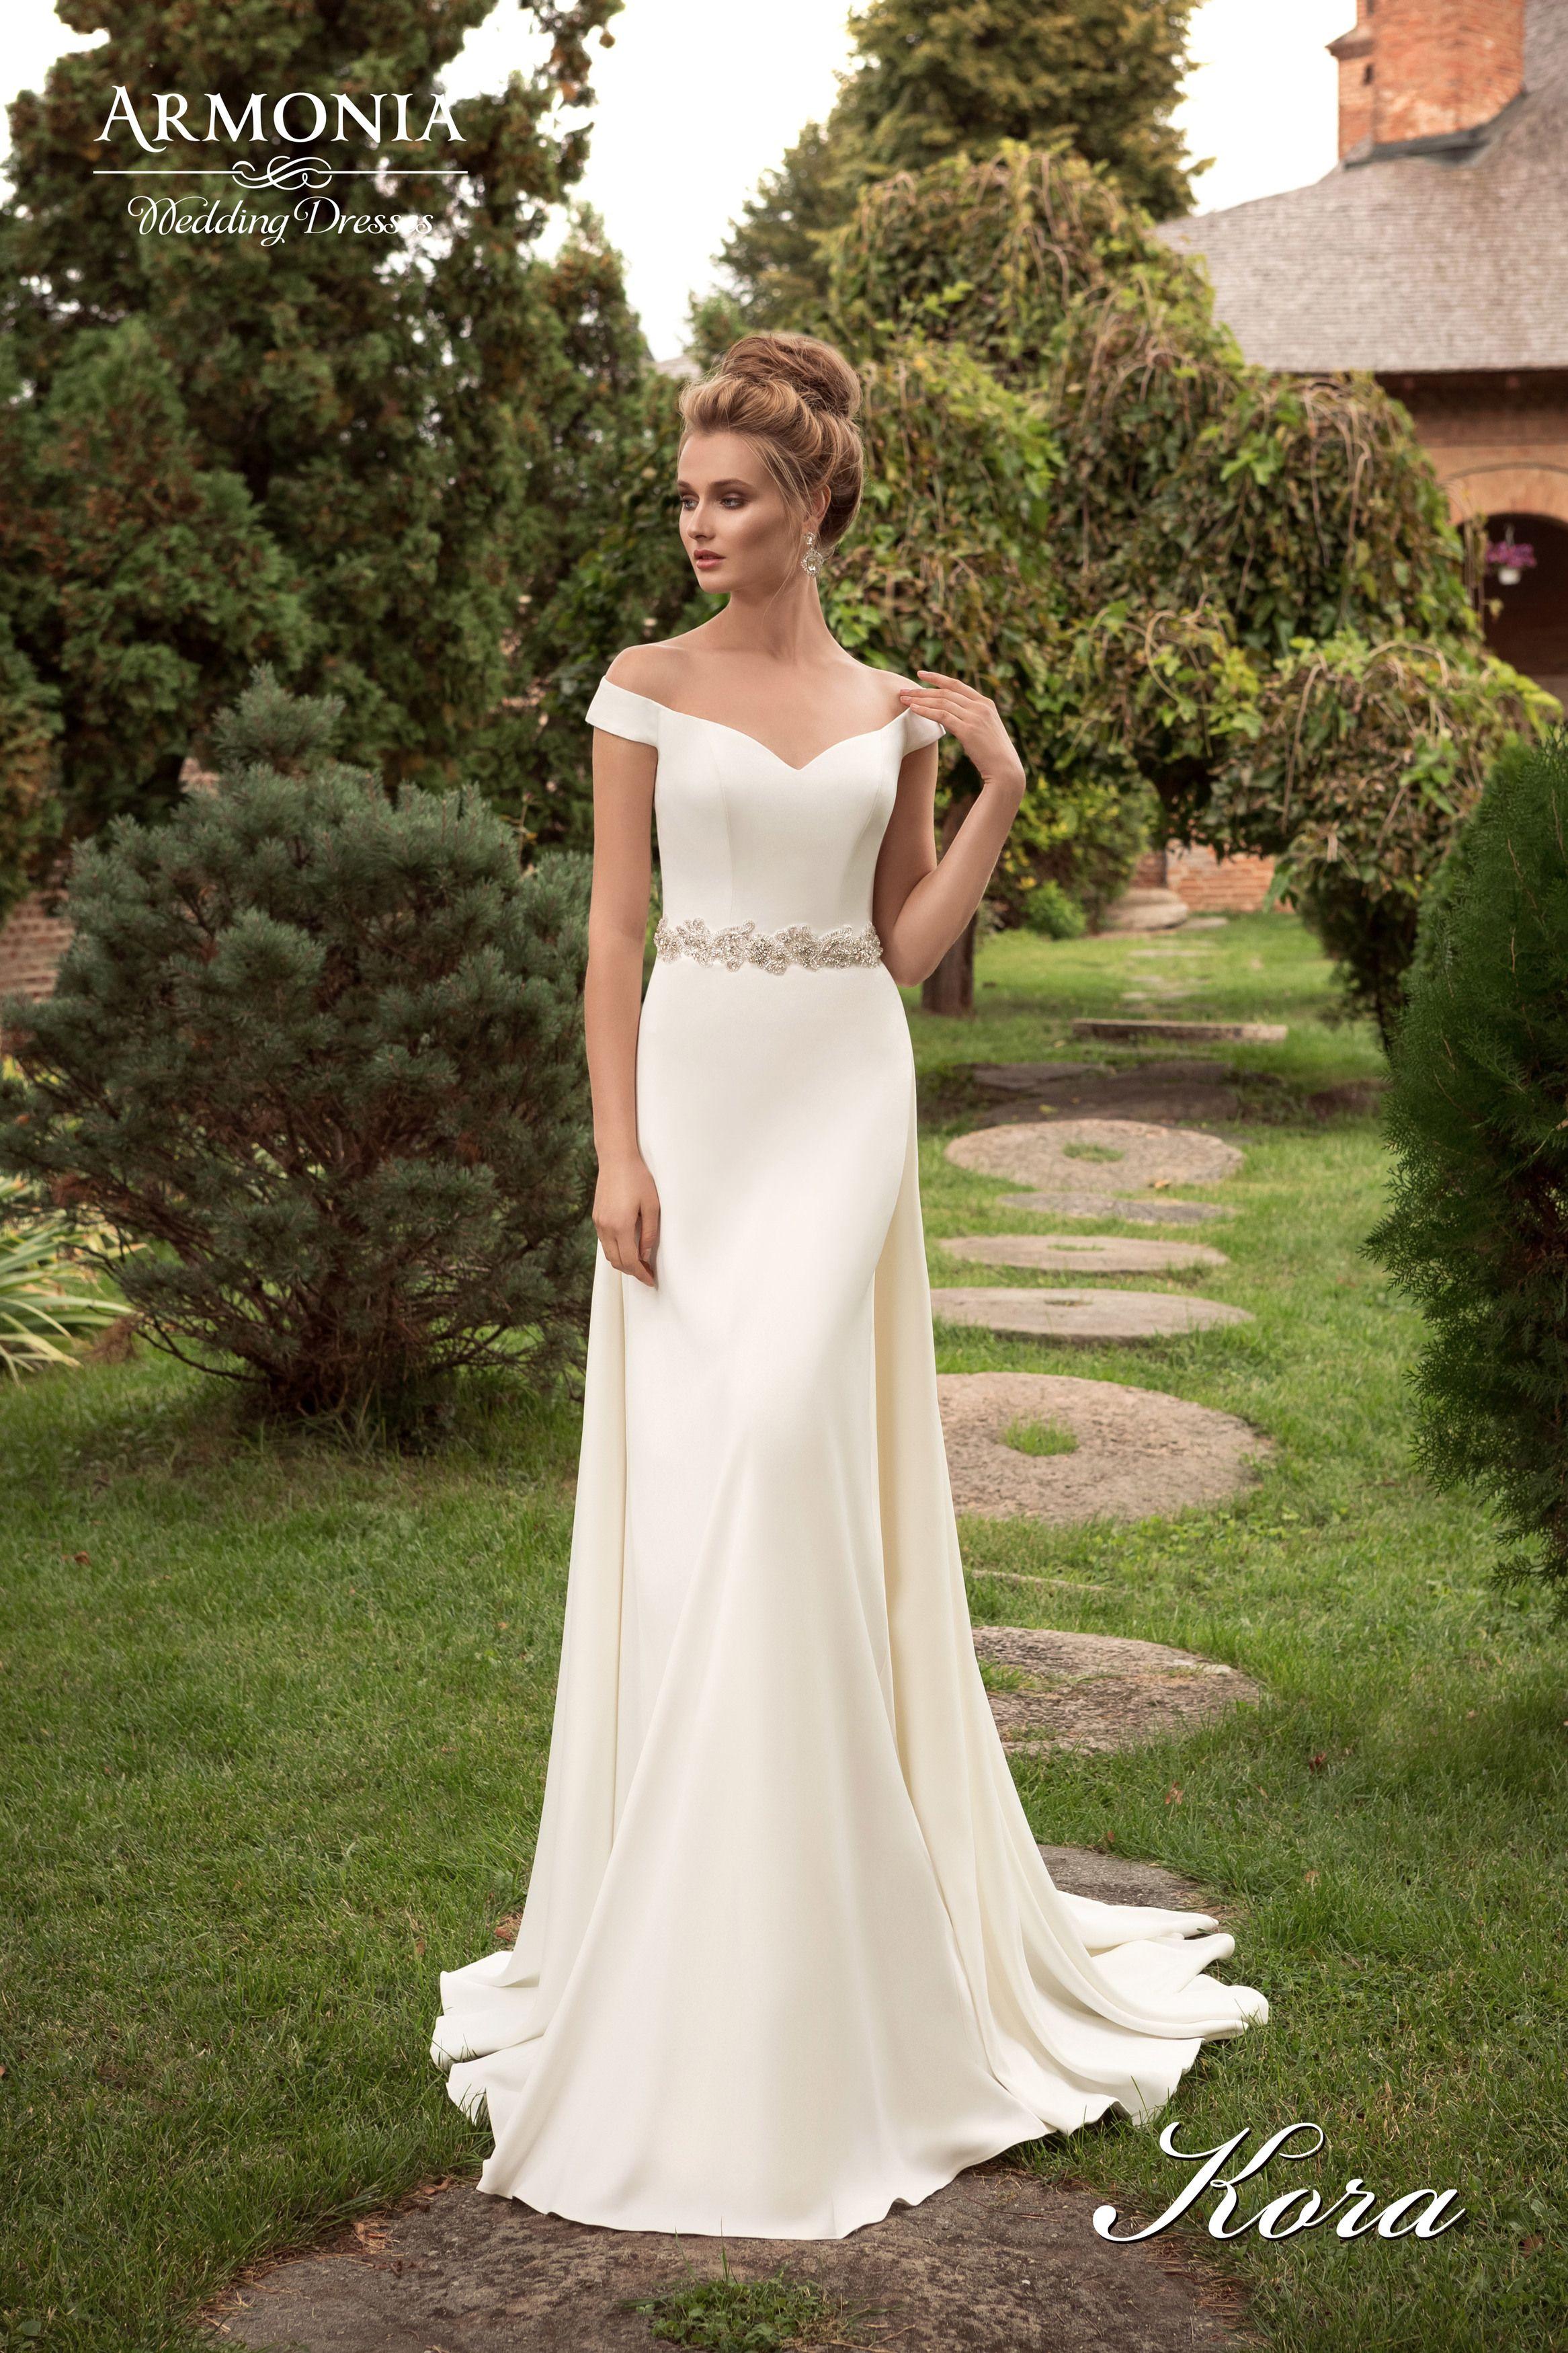 Gorgeous Wedding Dress | Wed | Pinterest | Neckline, Churches and ...